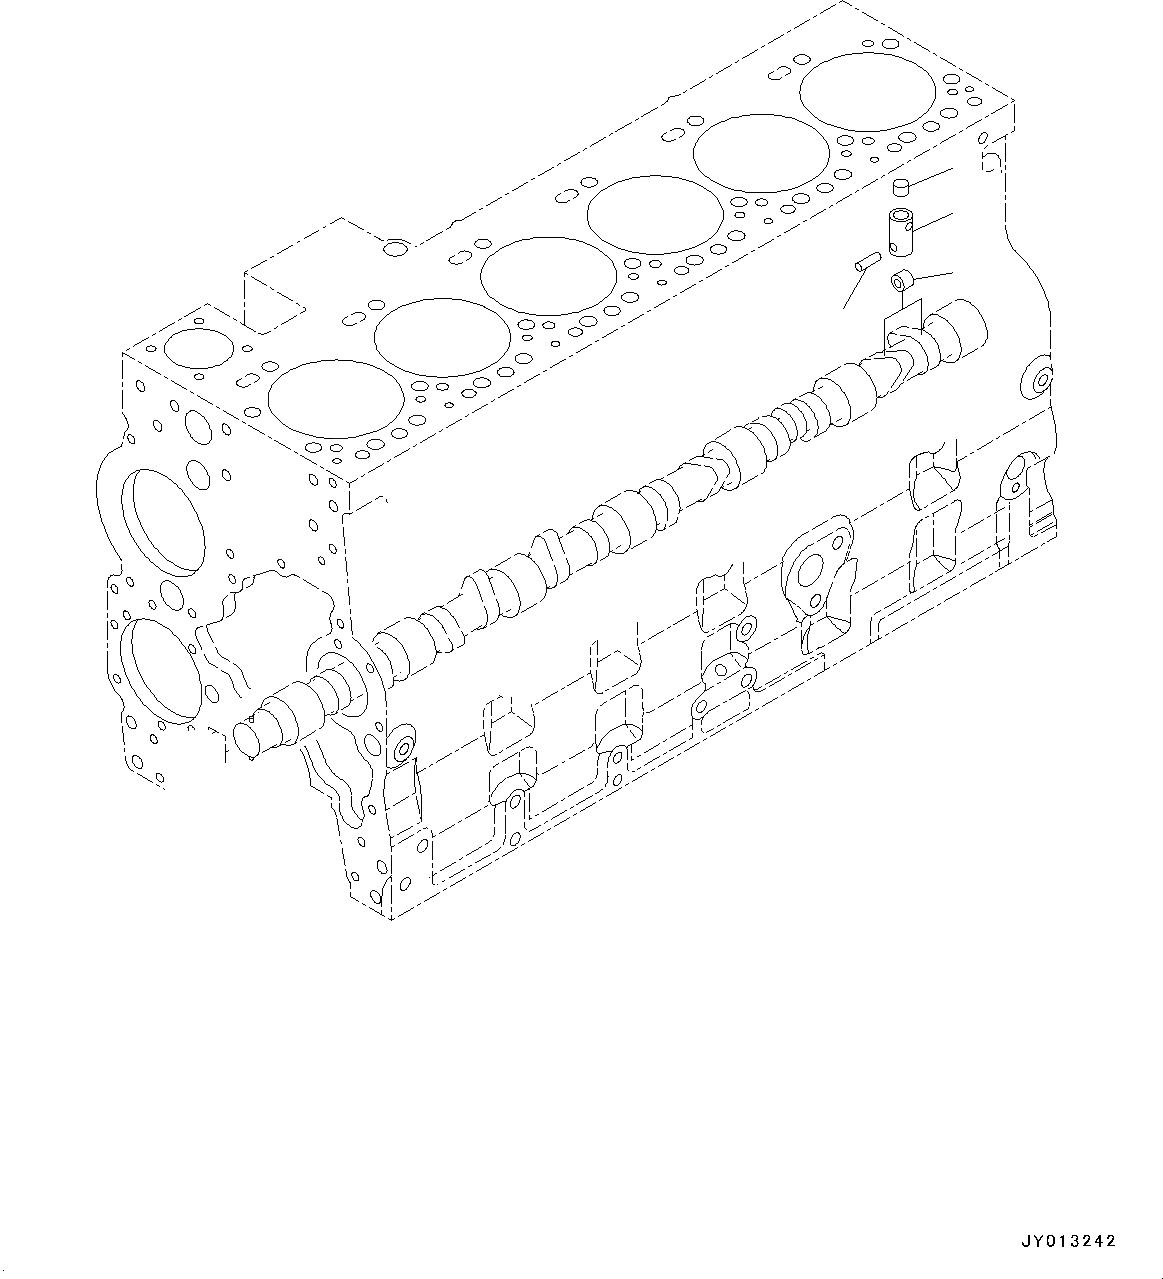 6742-01-1460 Komatsu ПРОБКА / ЗАГЛУШКА